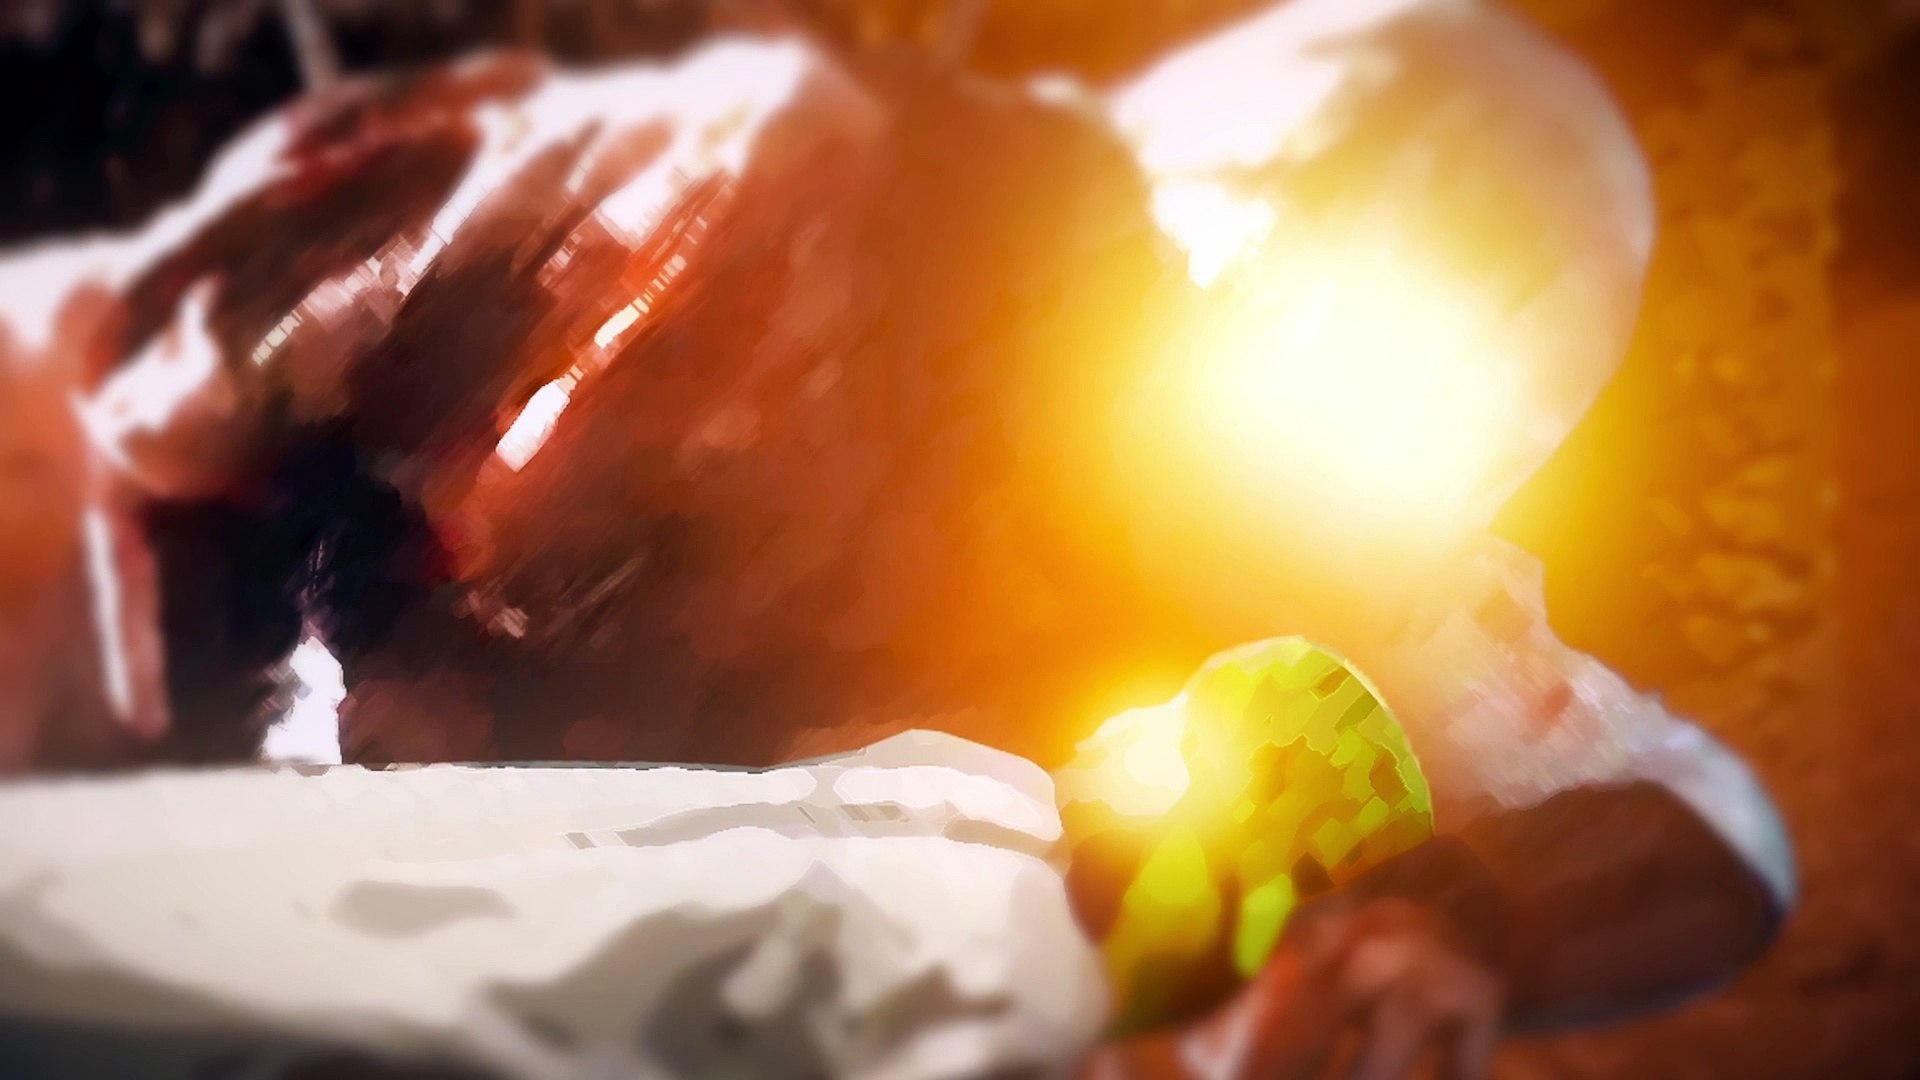 [Ep.5] THE BLOOD VENTURE (The Season of the Last Companion)